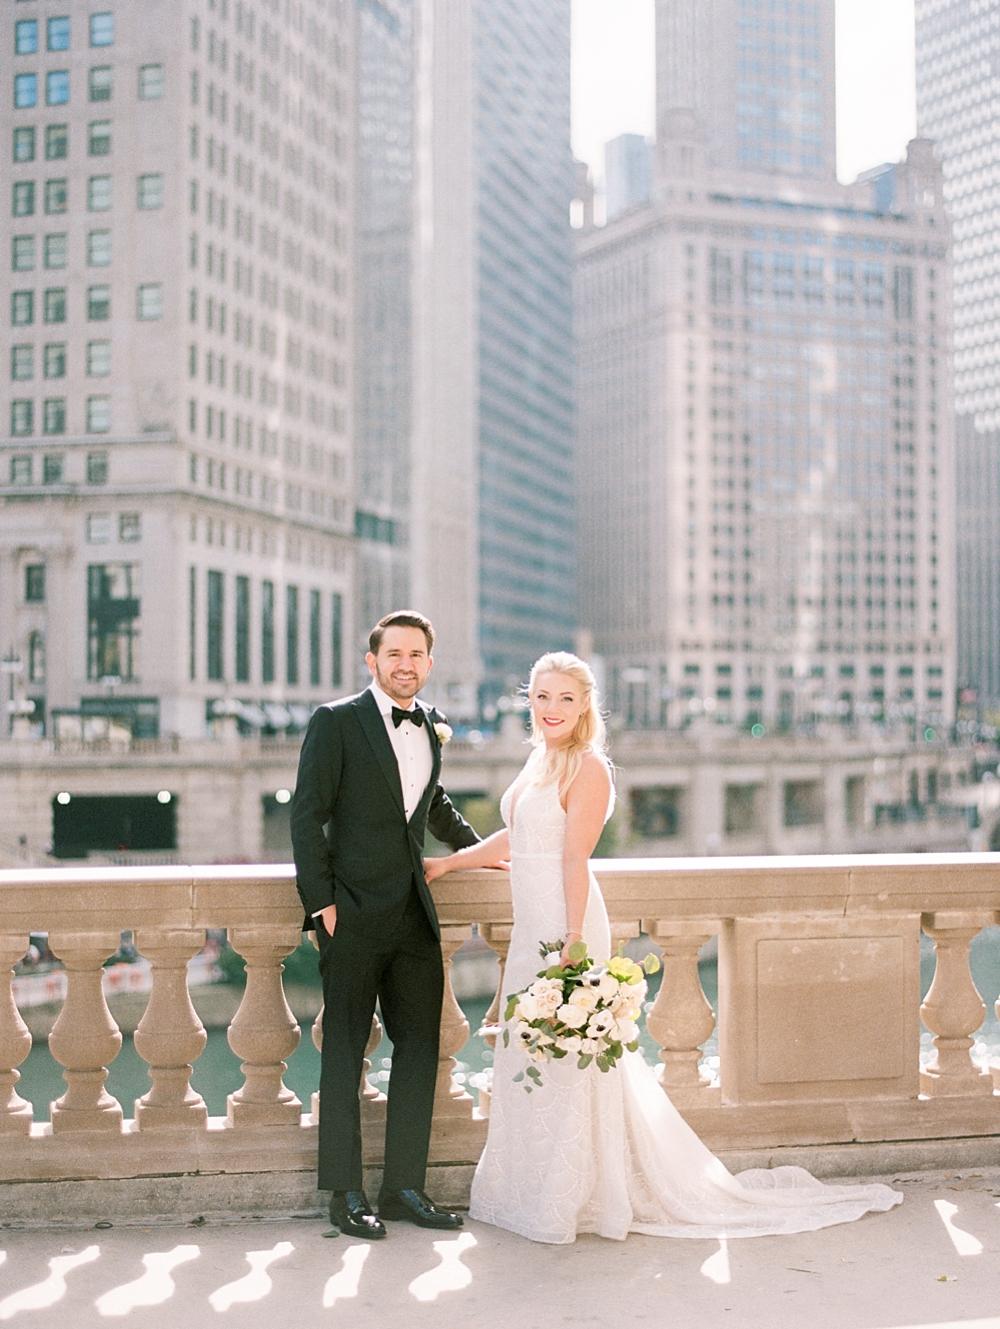 kristin-la-voie-photography-chicago-Wedding-Photographer-kimpton-gray-hotel-127